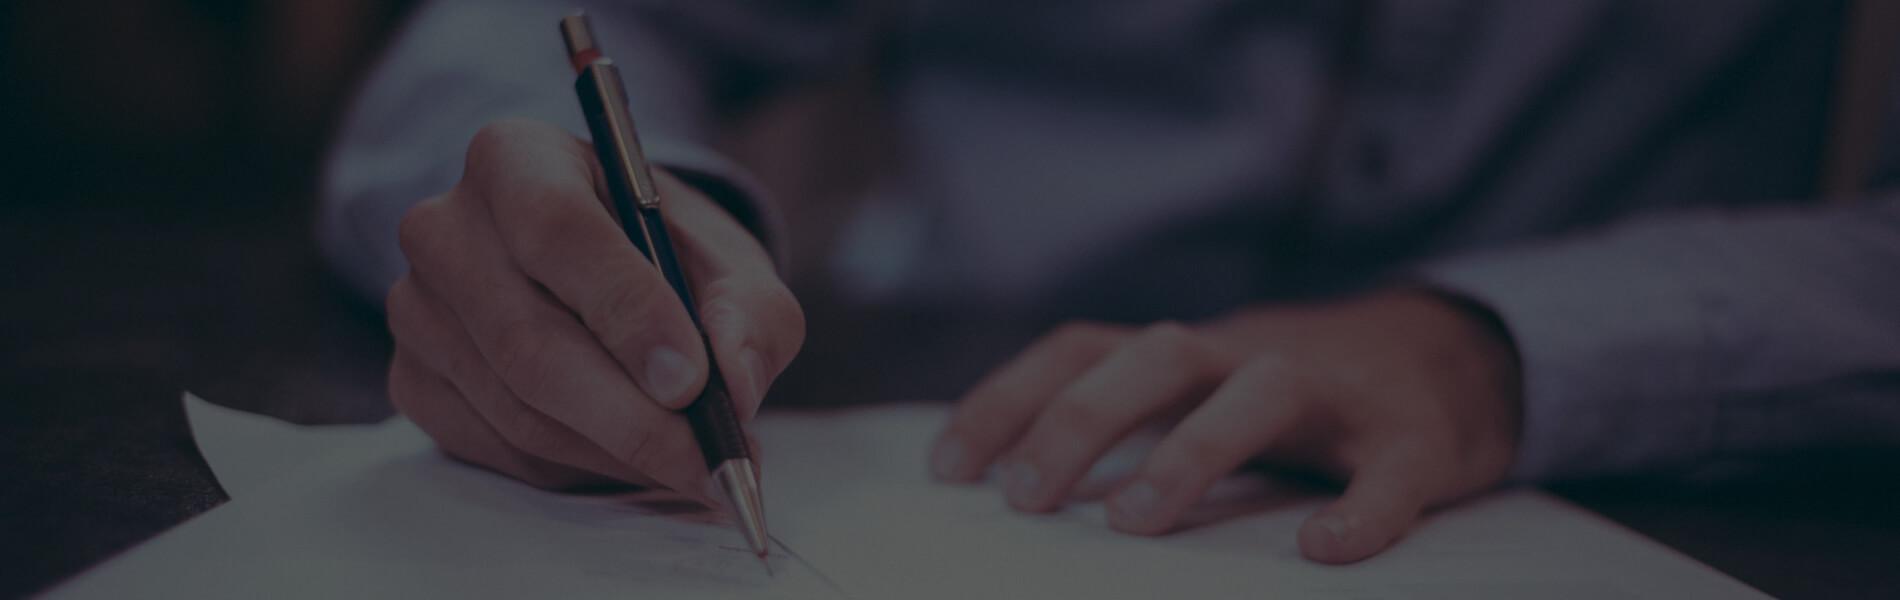 公司報稅 -資料預備